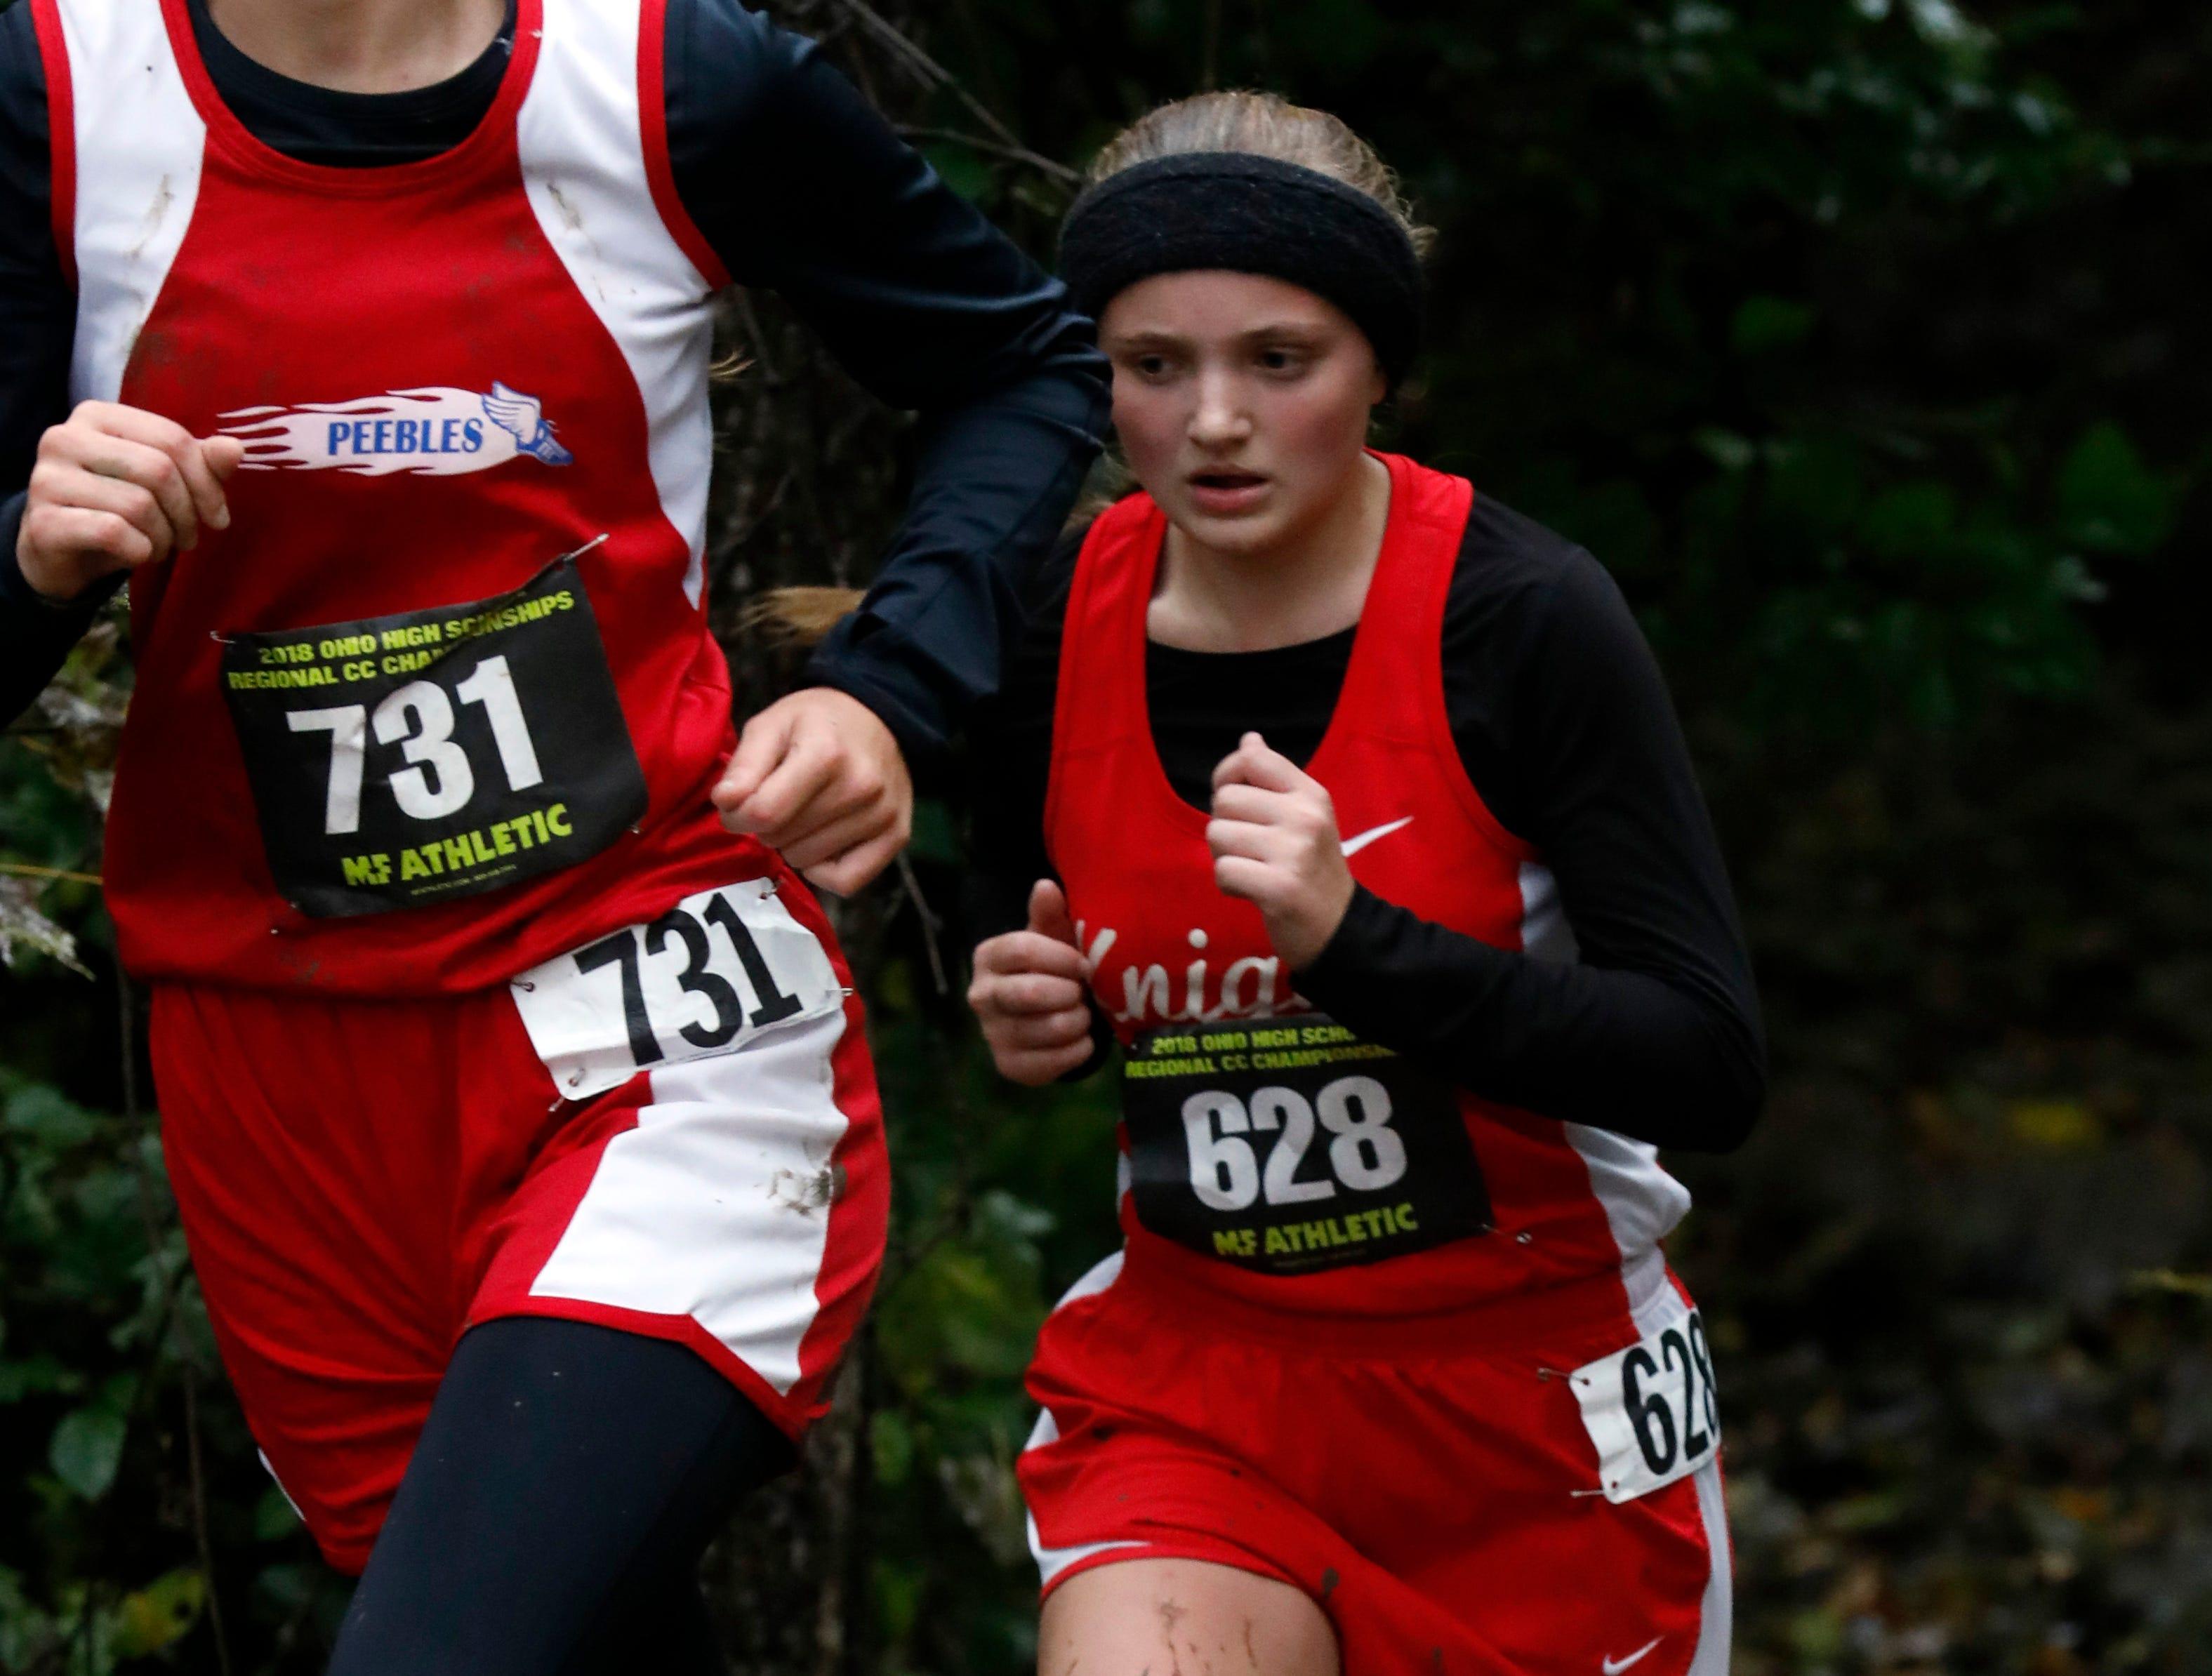 Fairfield Christian's Cassie Thompson runs in the Regional Cross Country meet Saturday, Oct. 27, 2018, at Pickerington North High School in Pickerington.